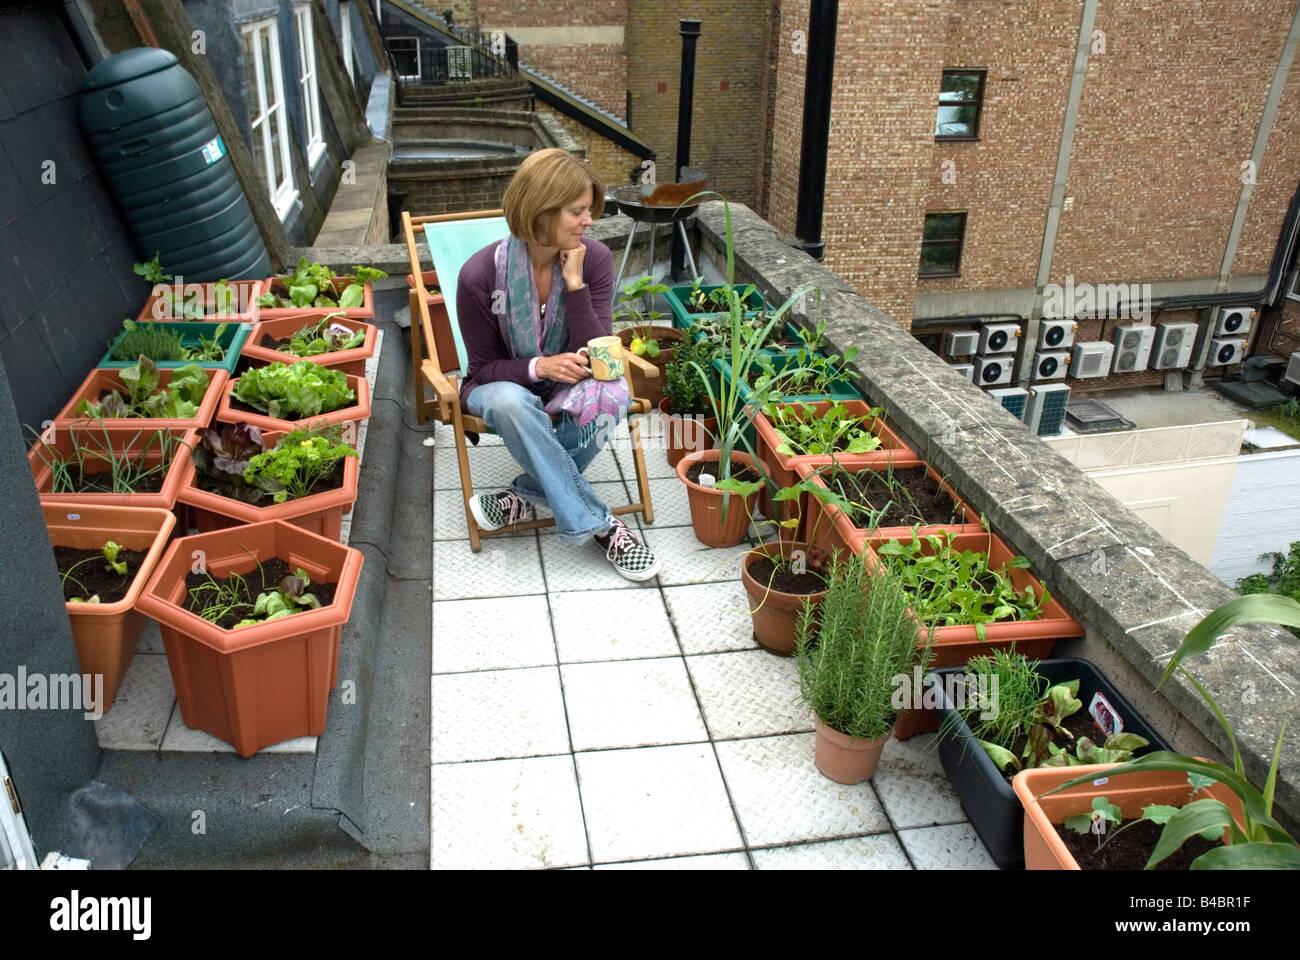 woman looking at vegetables salads urban rooftop vegetable garden rh alamy com vegetables on rooftop gardening planting vegetables on roof